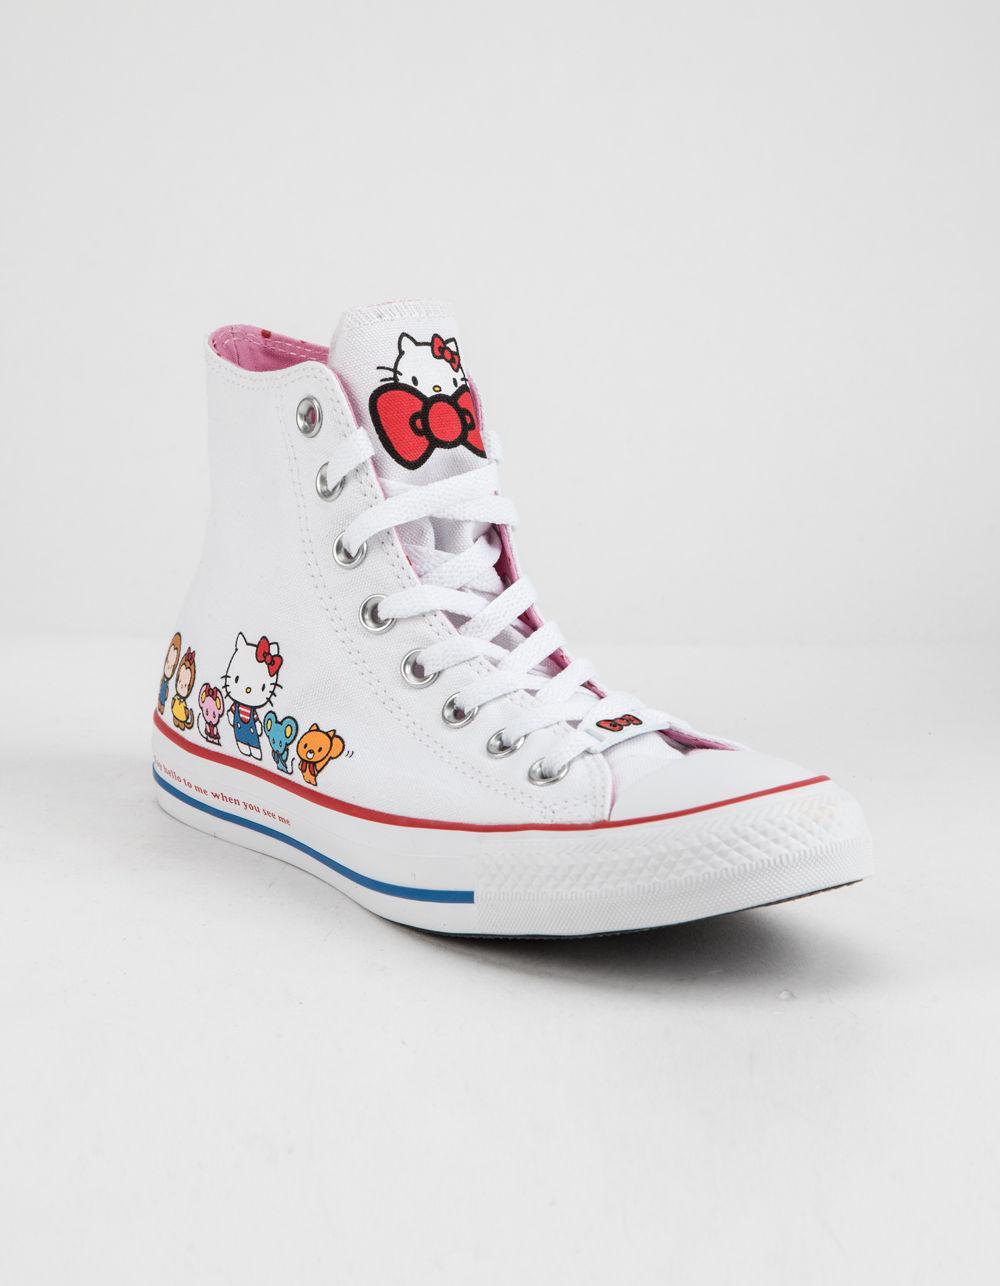 f67eb78a5de4 Lyst - Converse X Hello Kitty Chuck Taylor All Star White   Prism ...